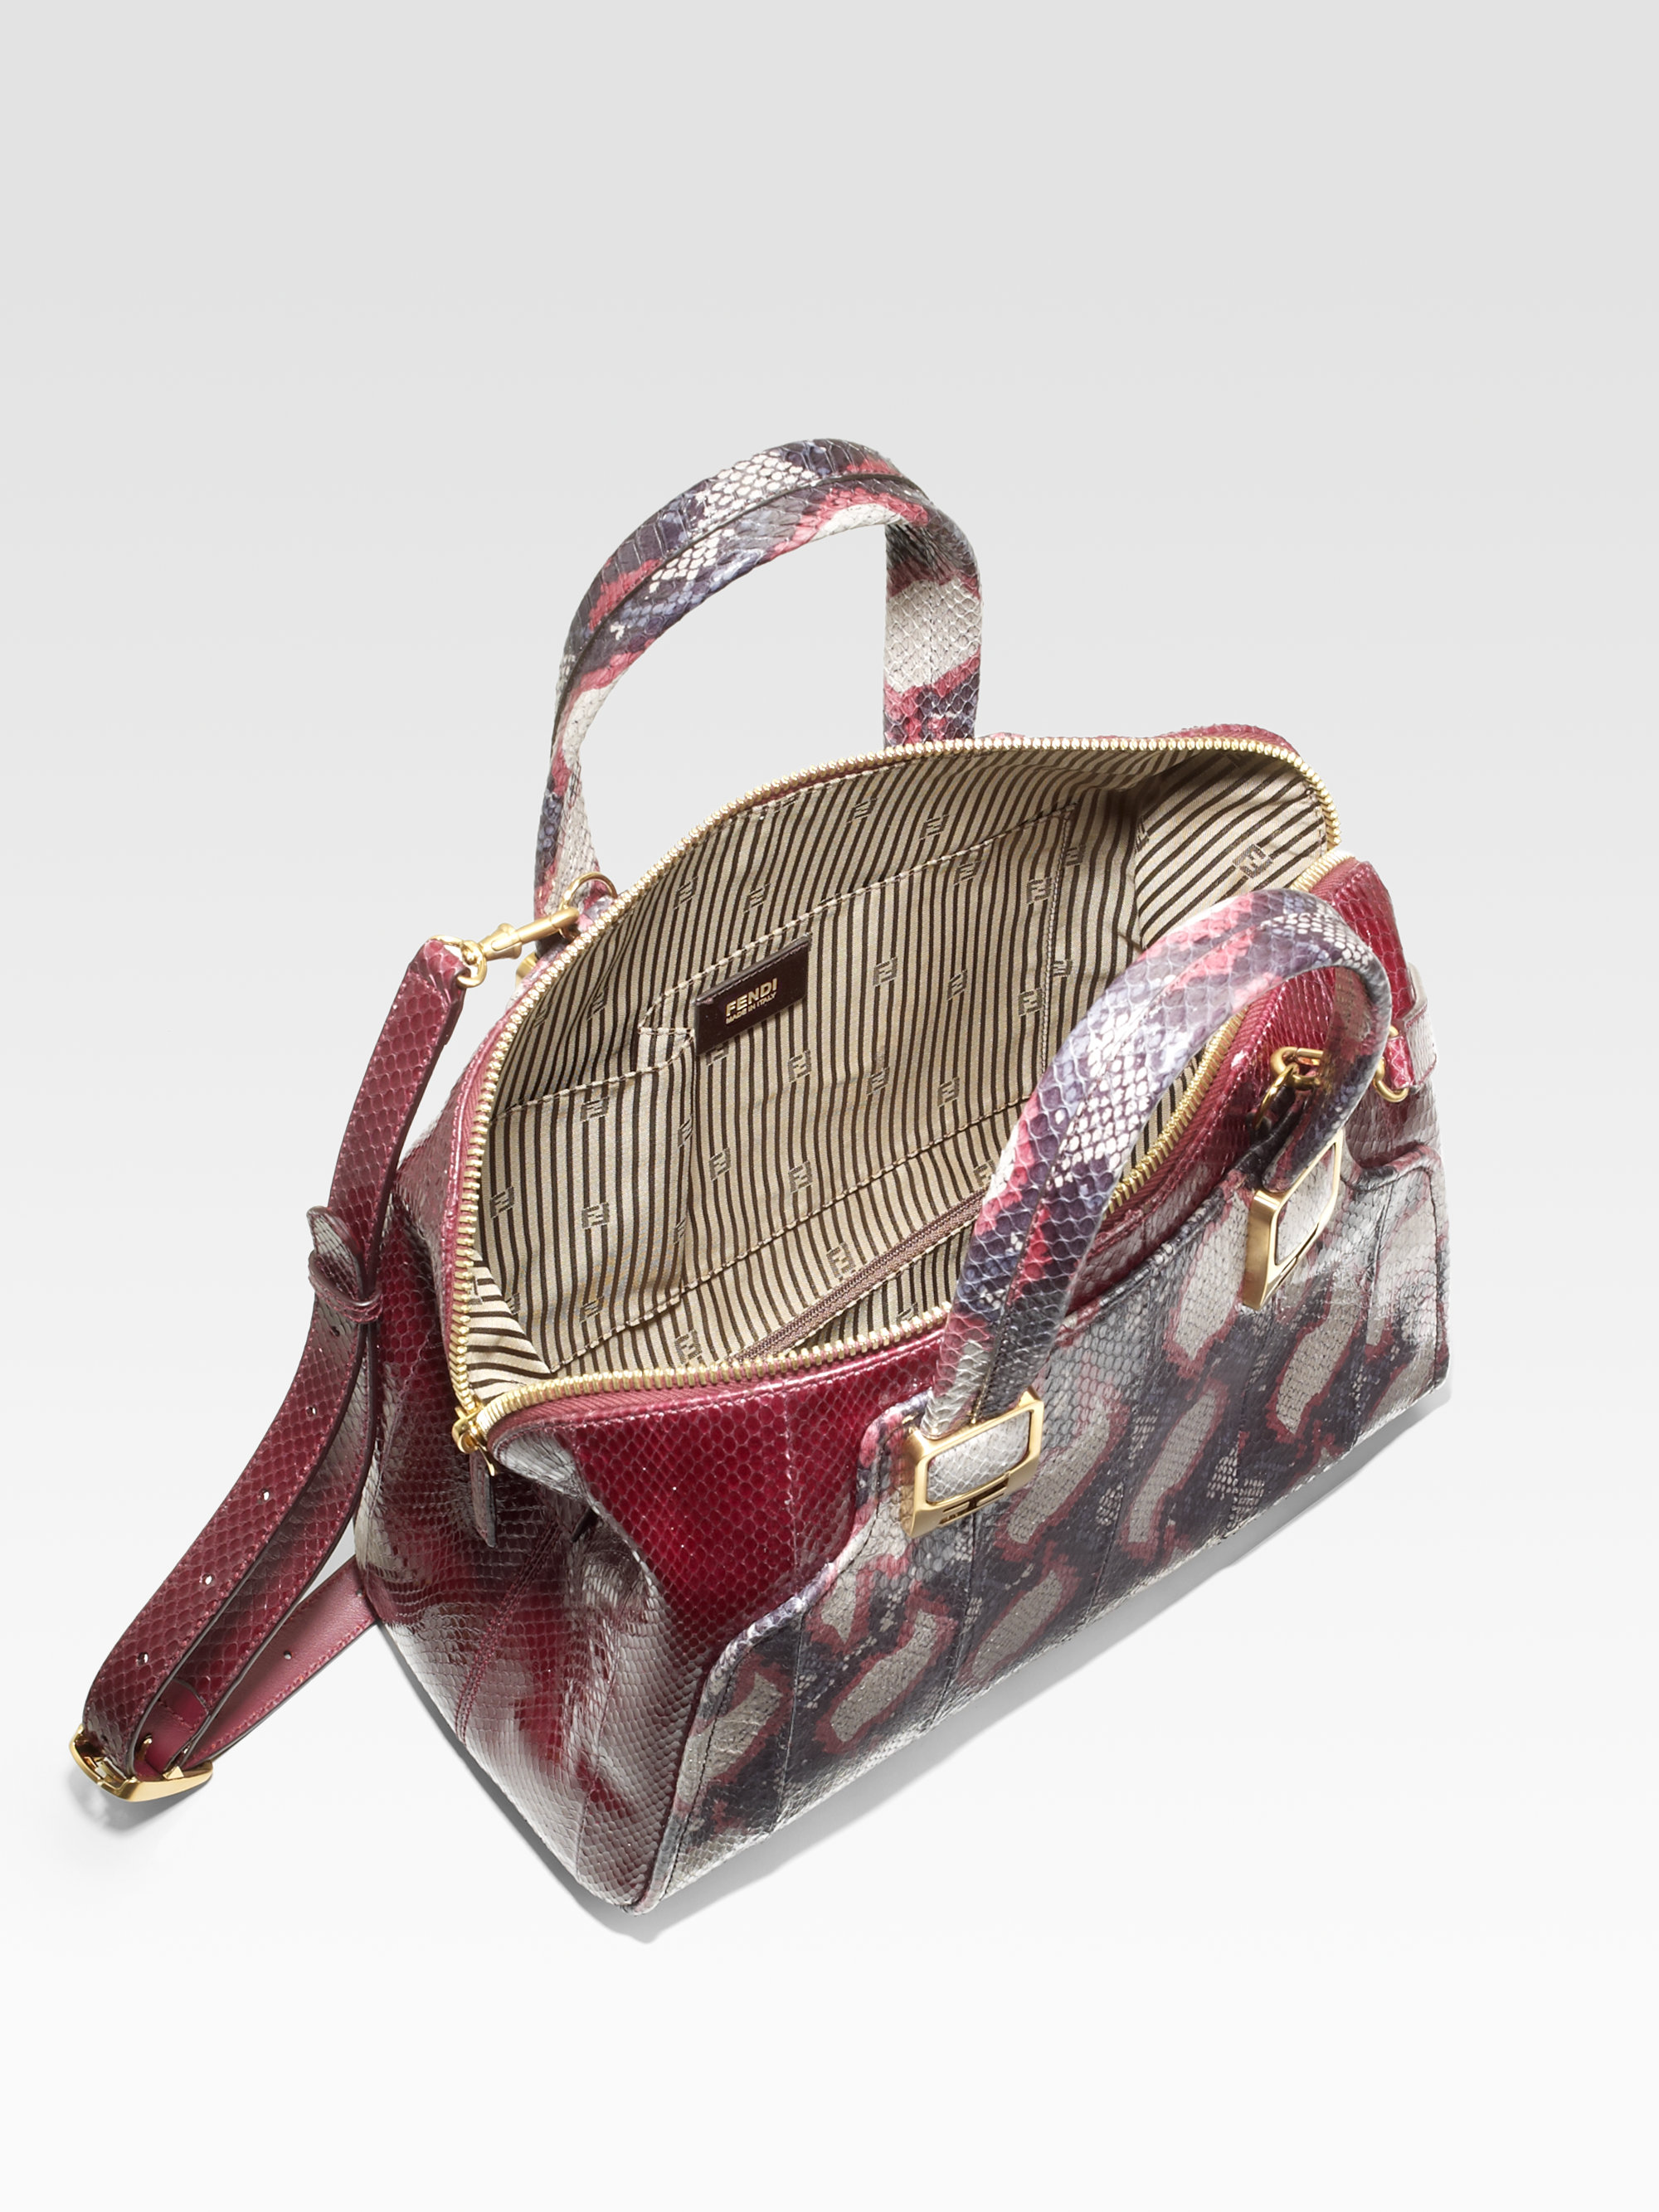 Fendi Ayers Python Top Handle Bag in Purple (burgundy-grey) | Lyst